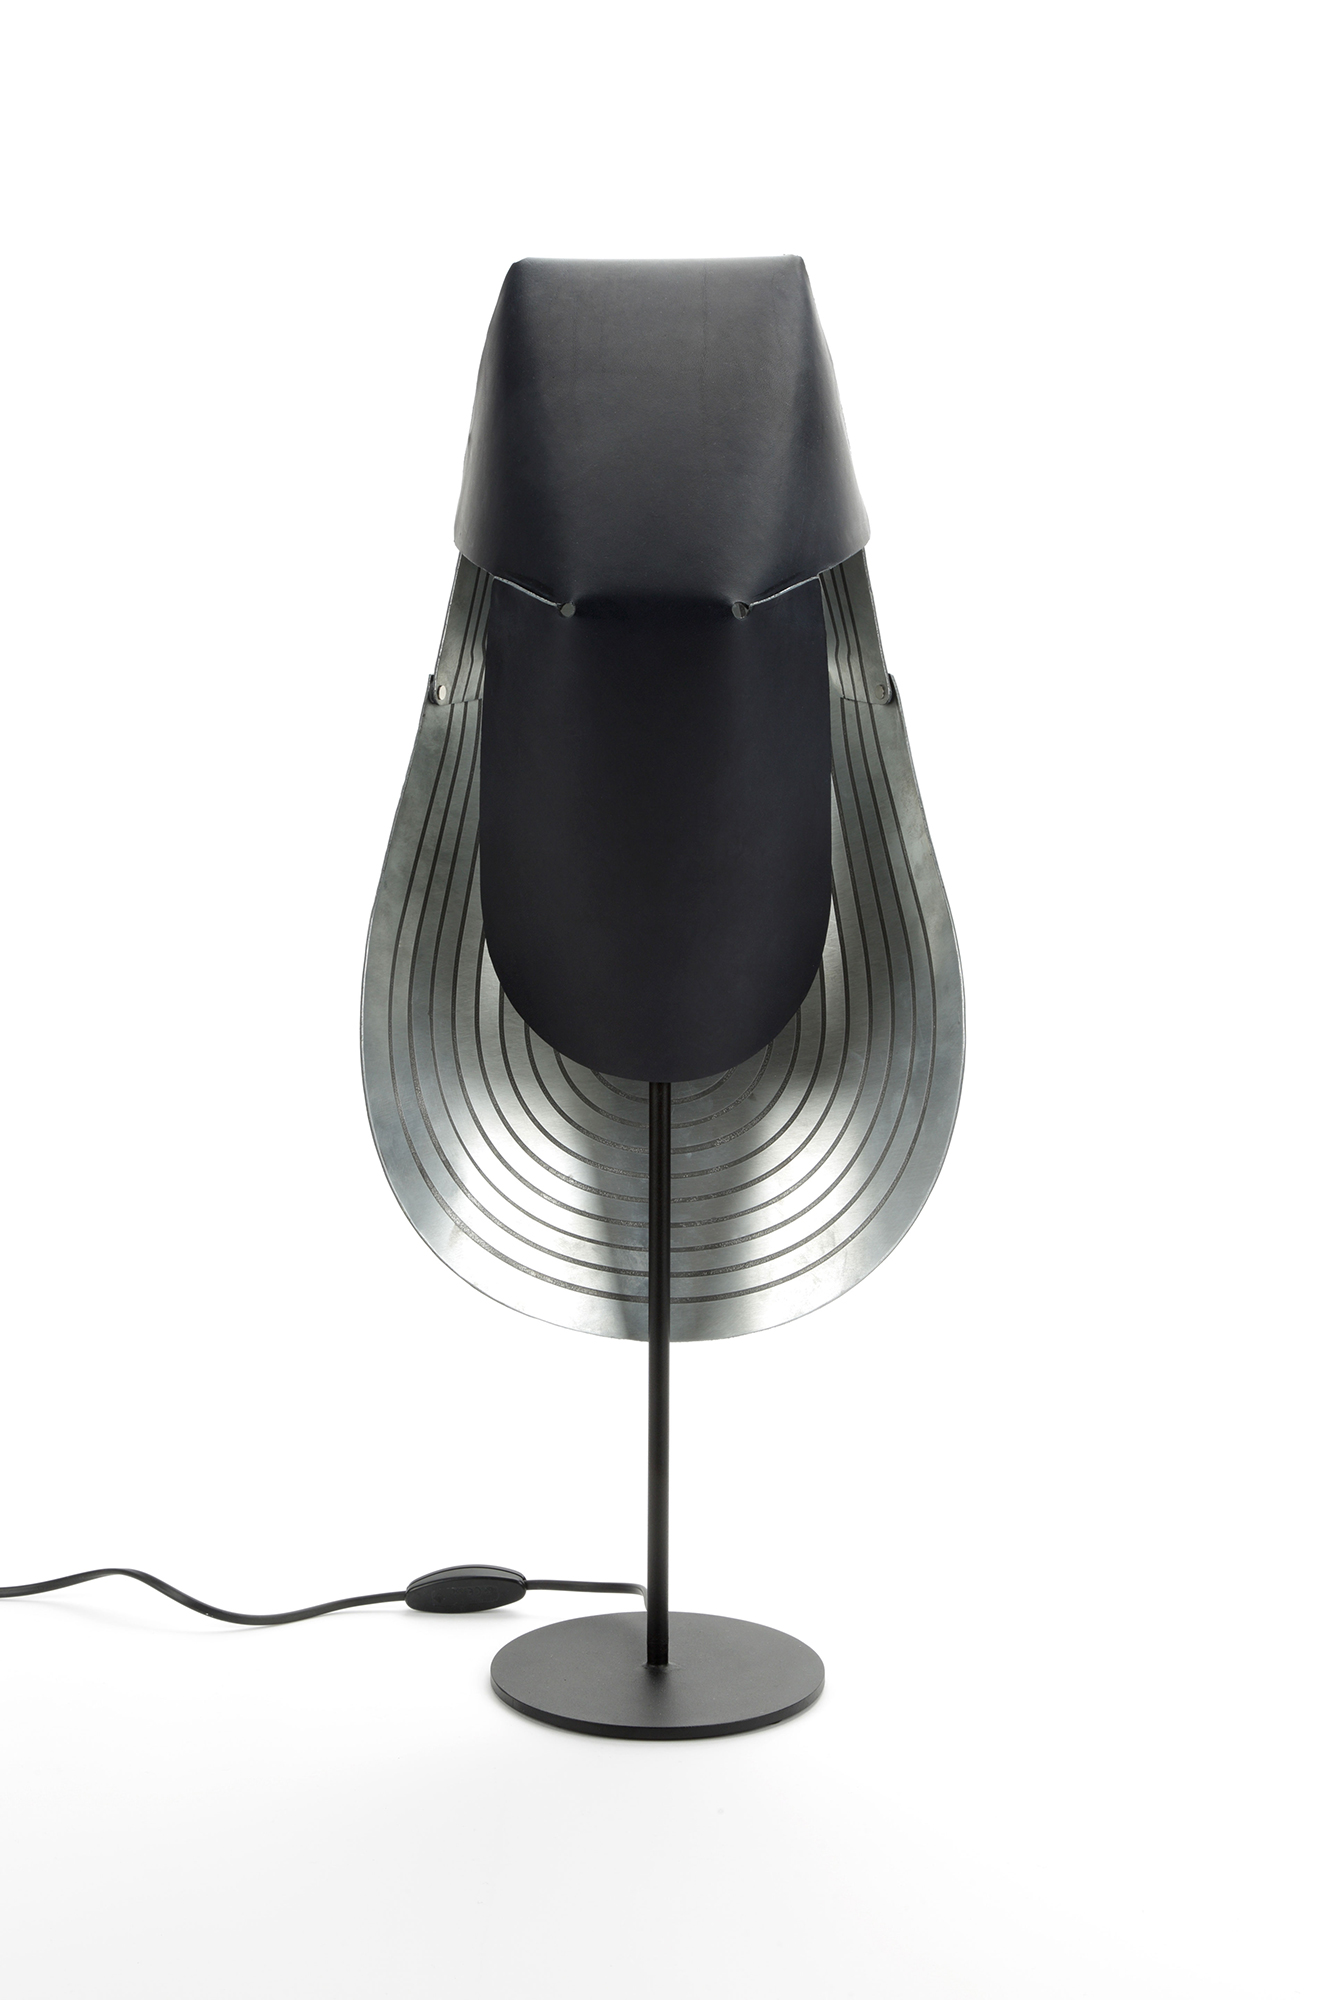 Lampe Oiseau de Nuit